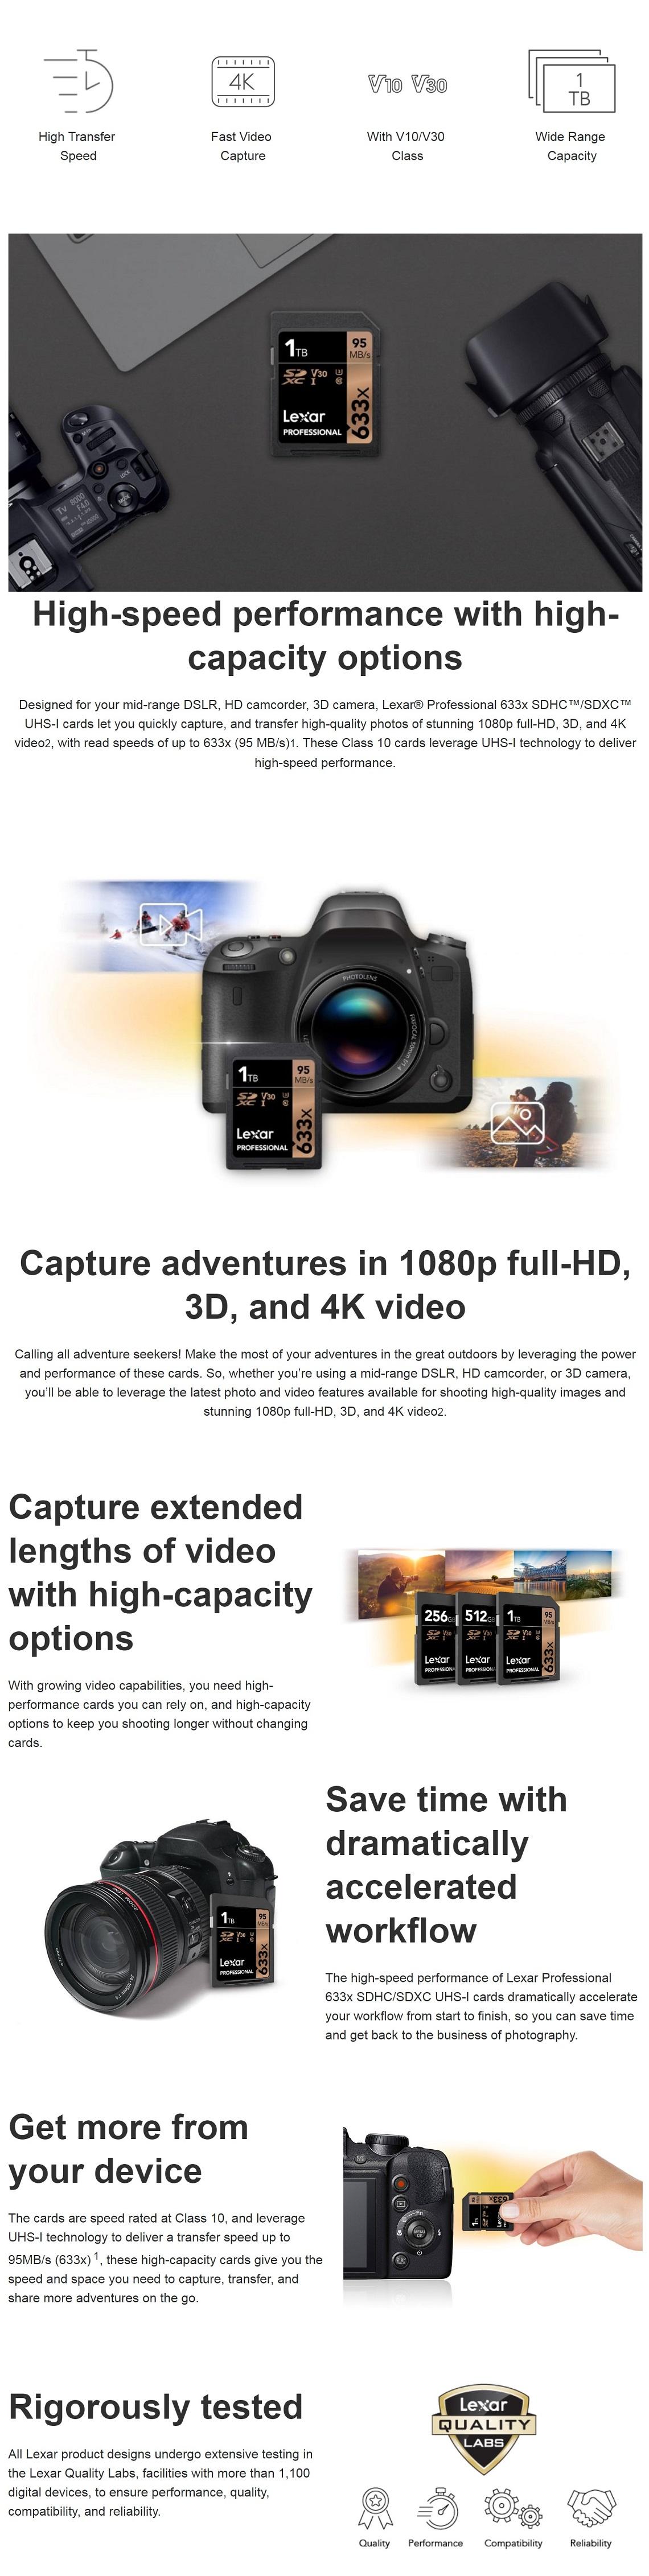 Lexar 512GB Professional 633x SDXC UHS-I Card - Upto 95MBs Read/45MBs Write 4K